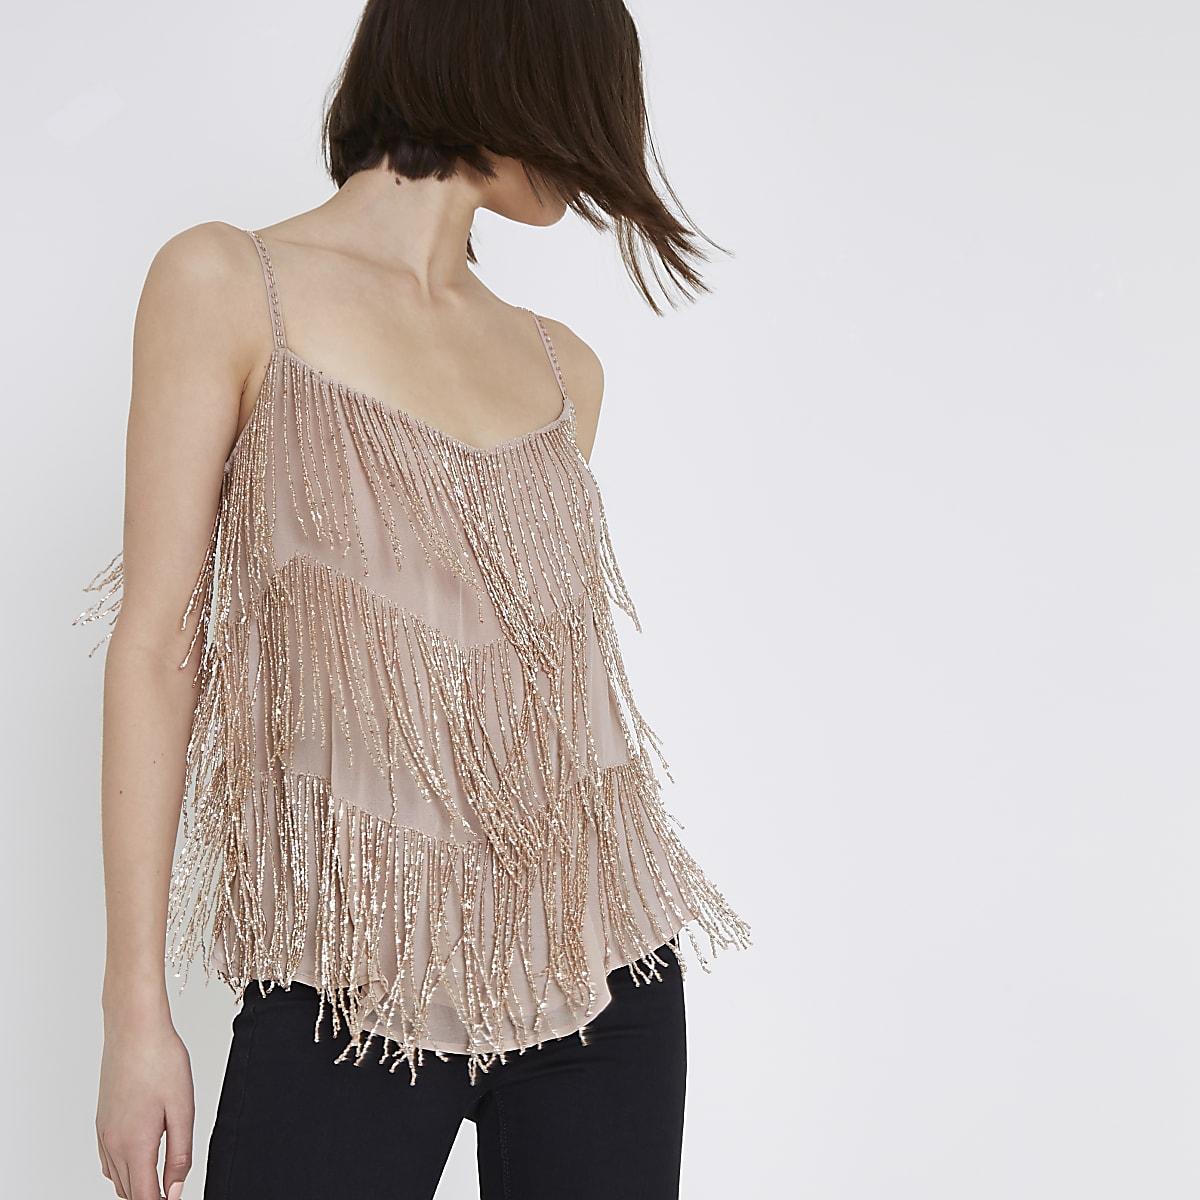 40680aa0be202c Pink beaded cami top - Cami / Sleeveless Tops - Tops - women